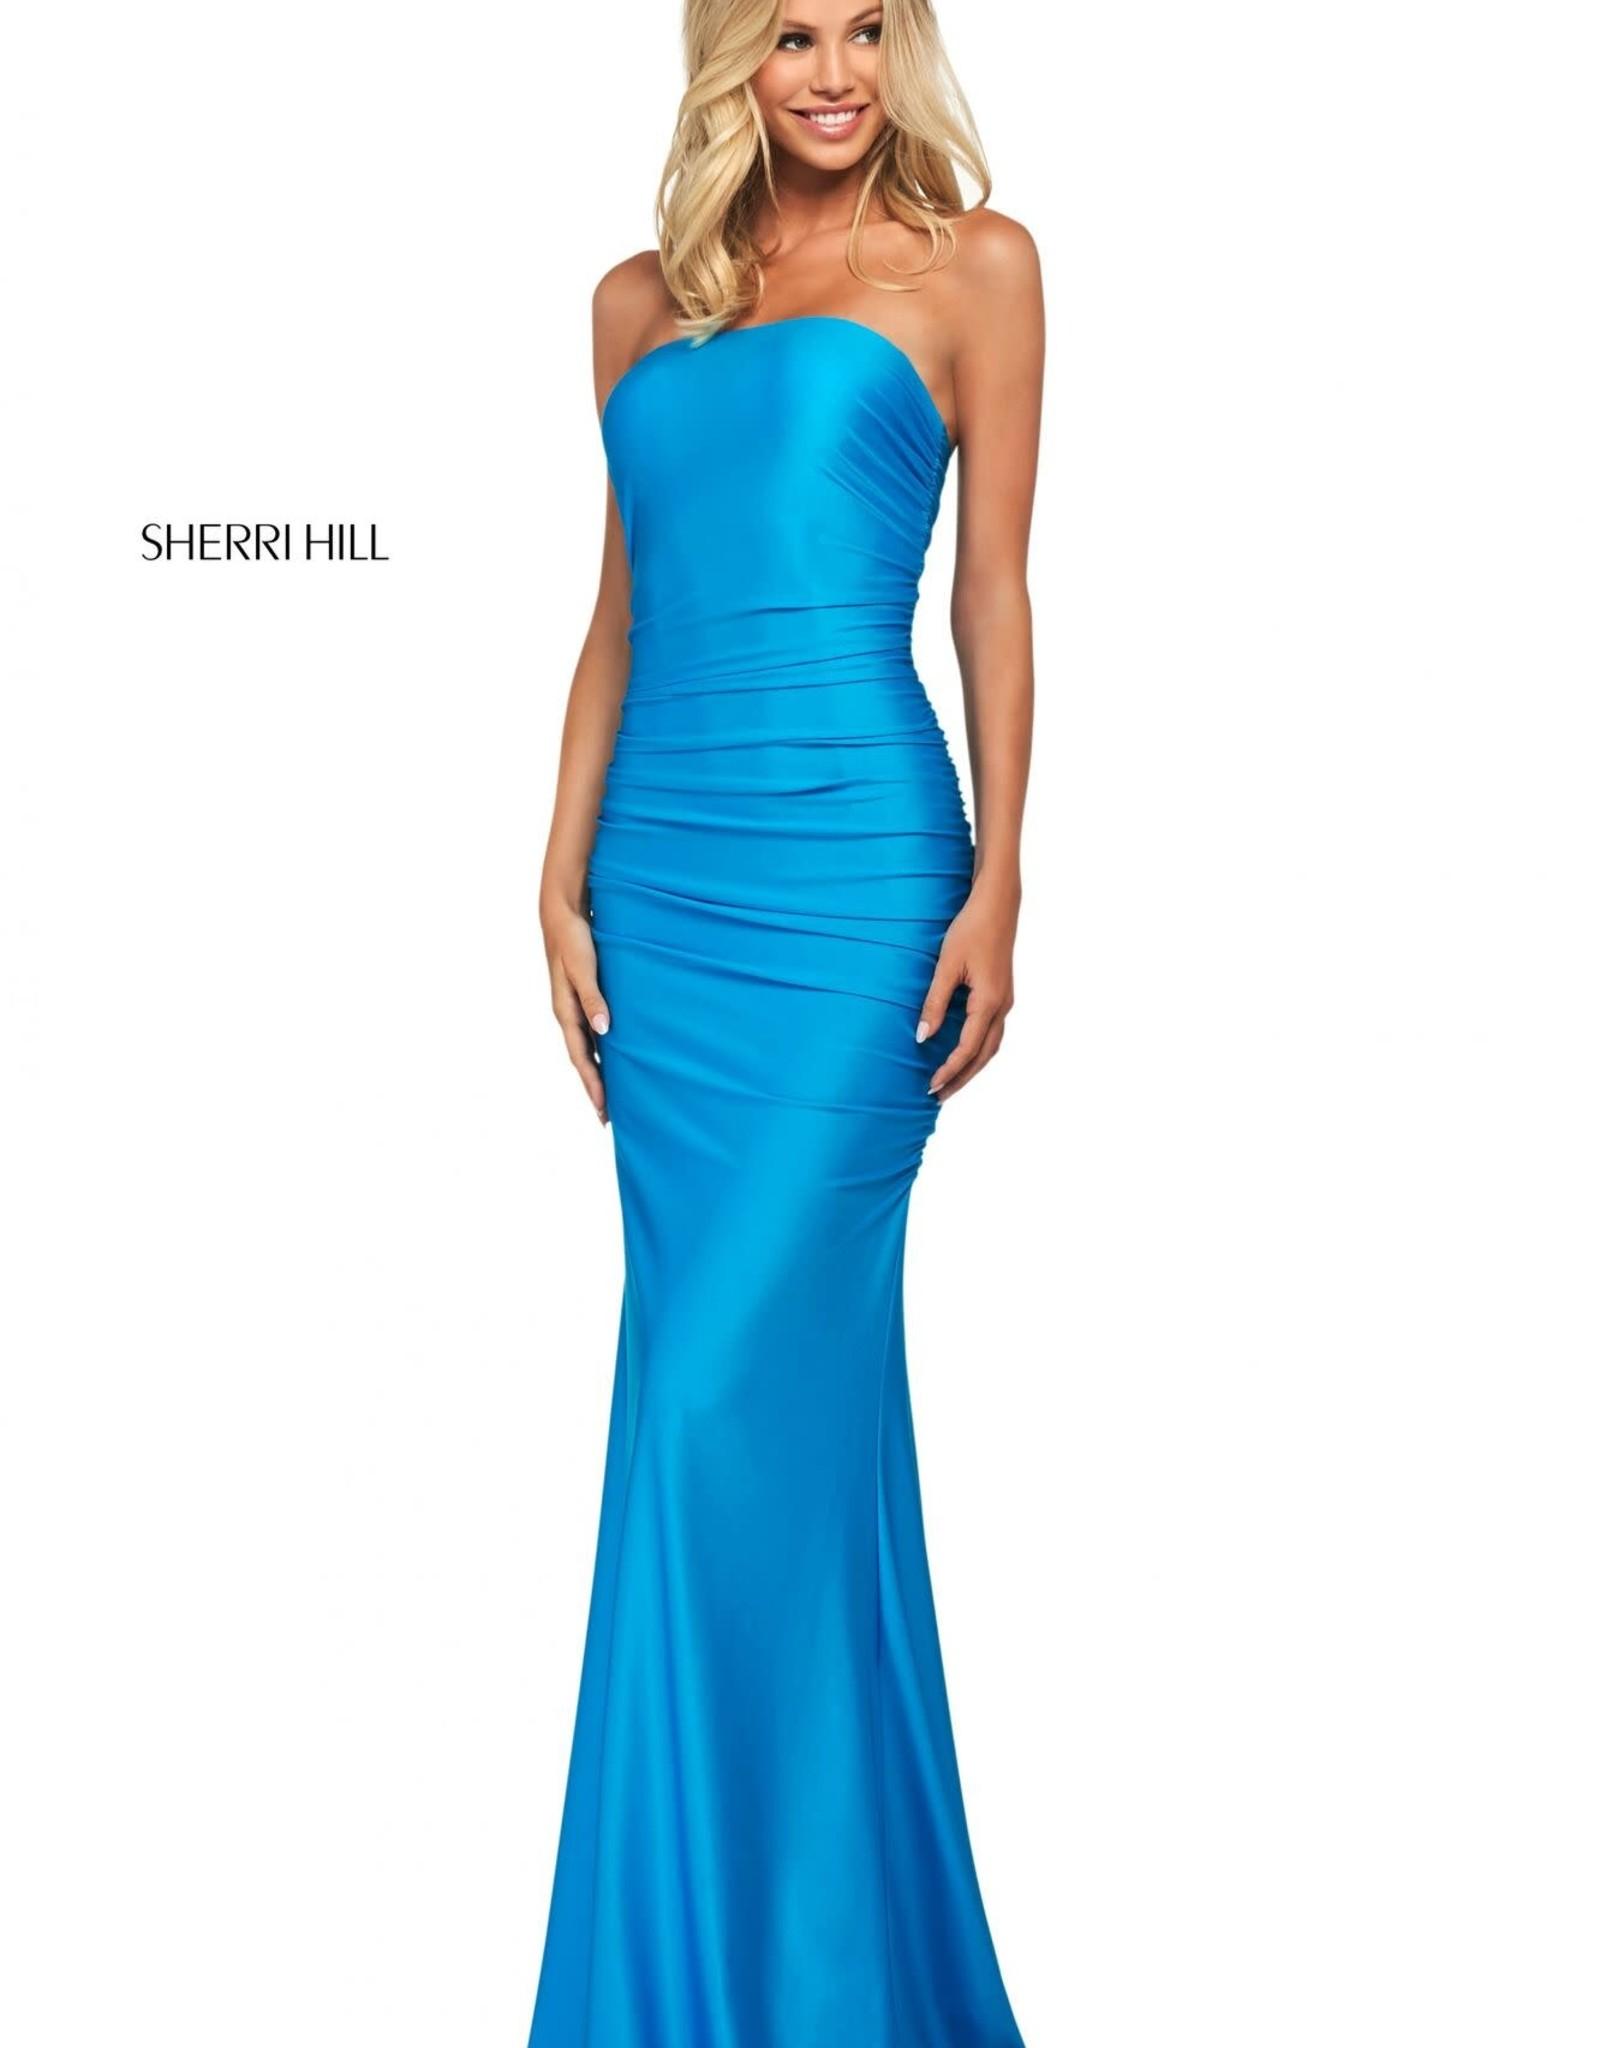 Sherri Hill Sherri Hill Peacock 4